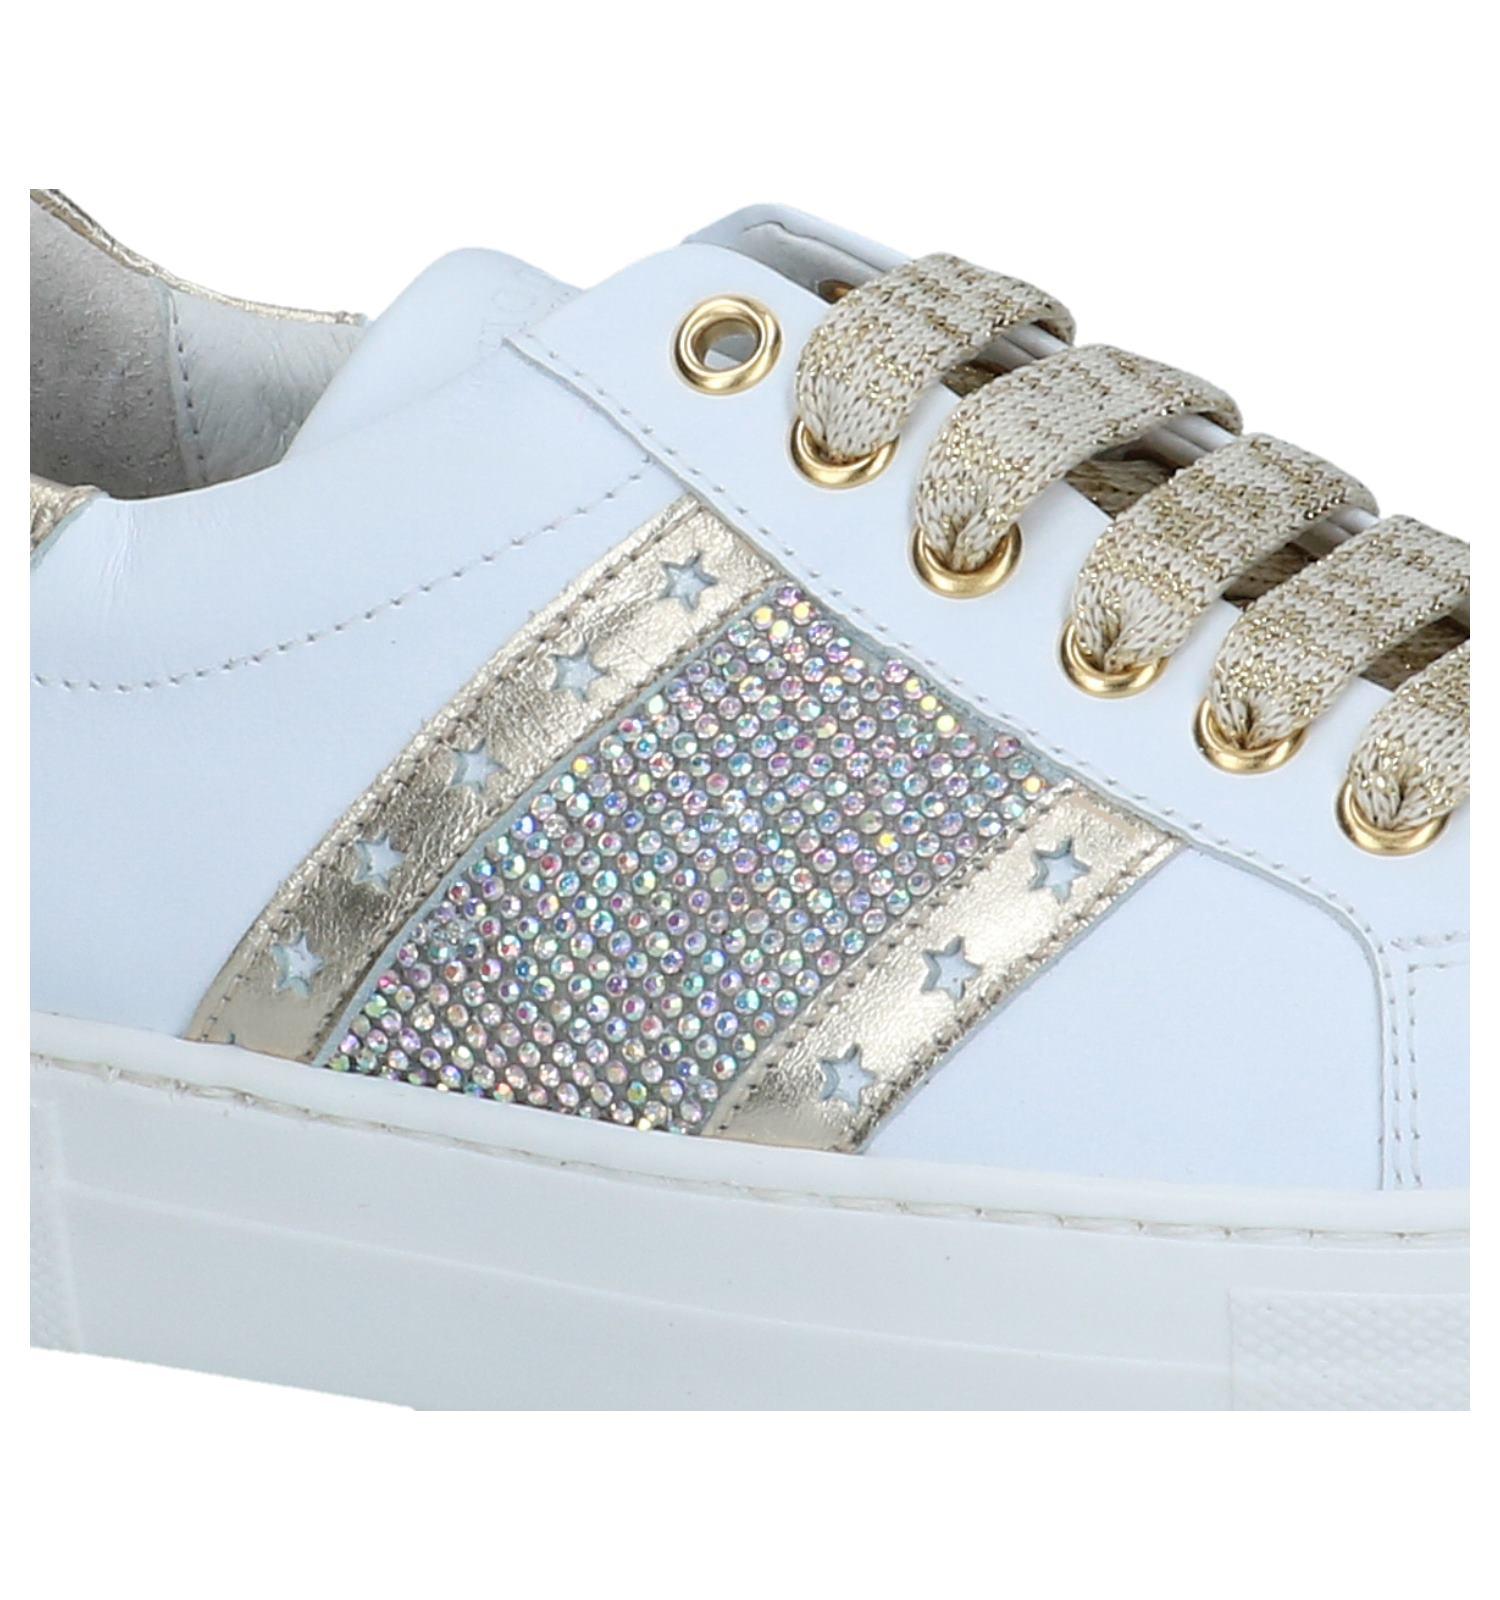 Witte Geklede Sneakers Hoops | SCHOENENTORFS.NL | Gratis